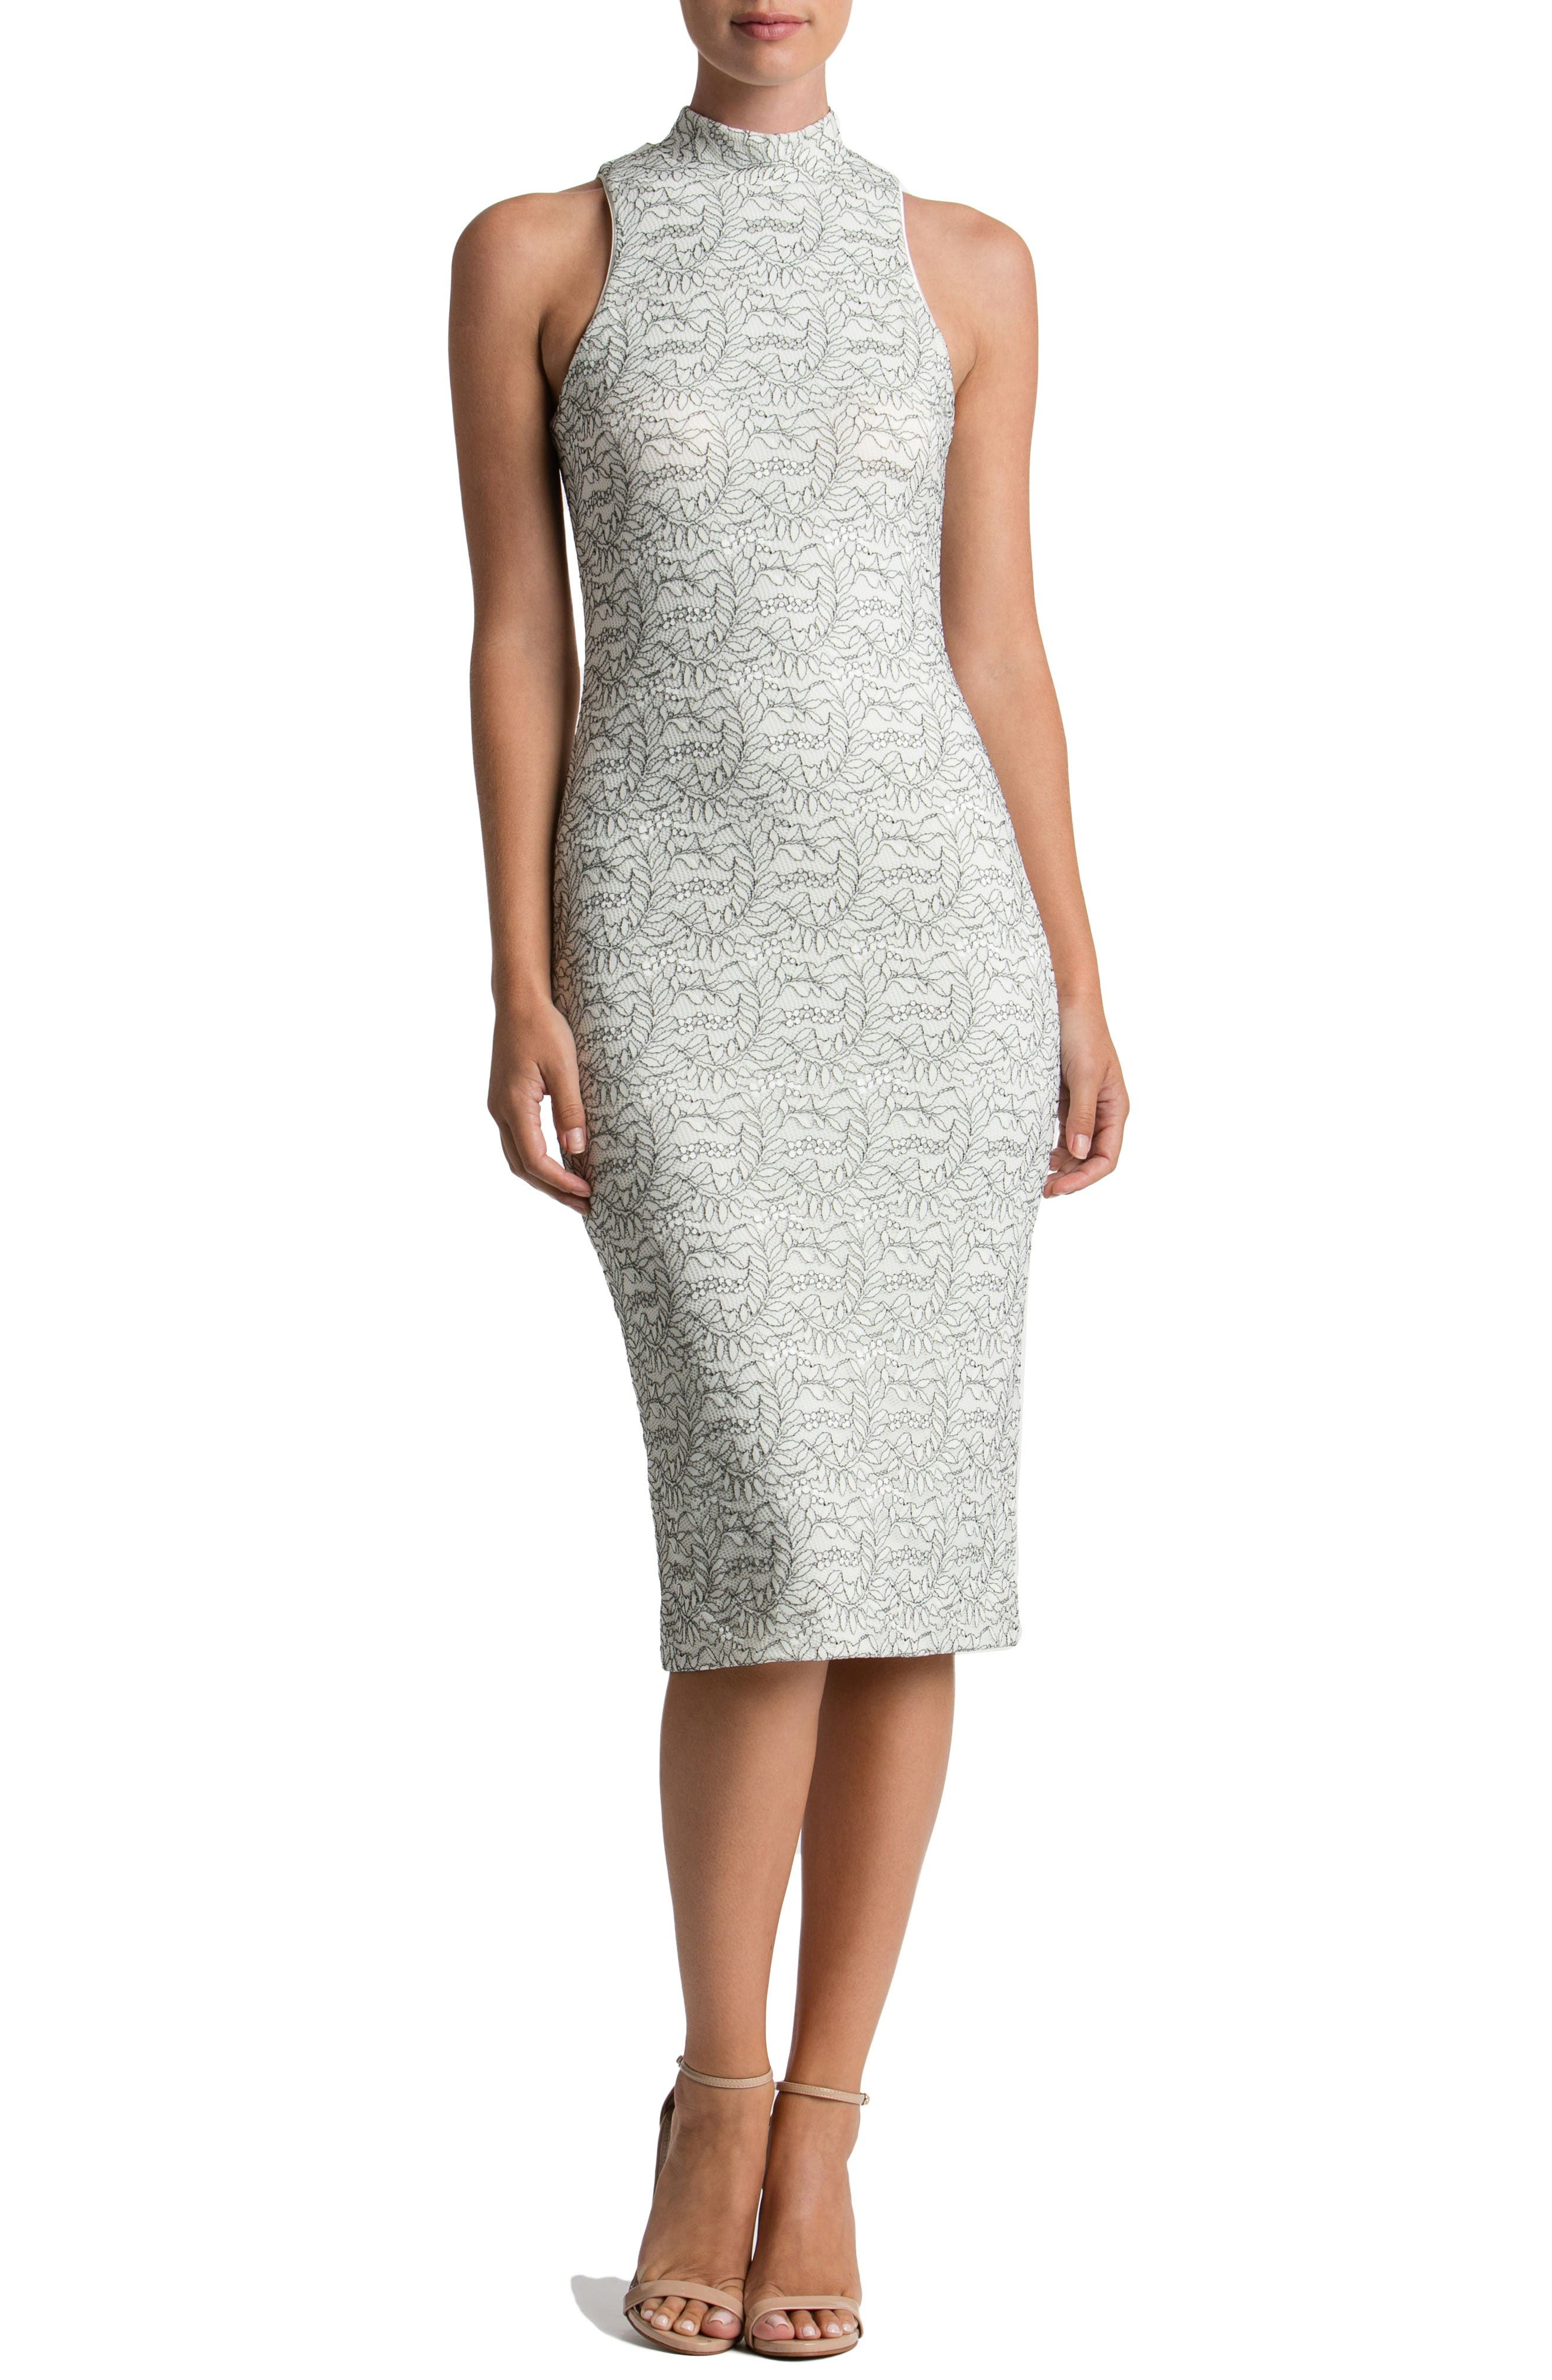 DRESS THE POPULATION Norah Lace Midi Dress